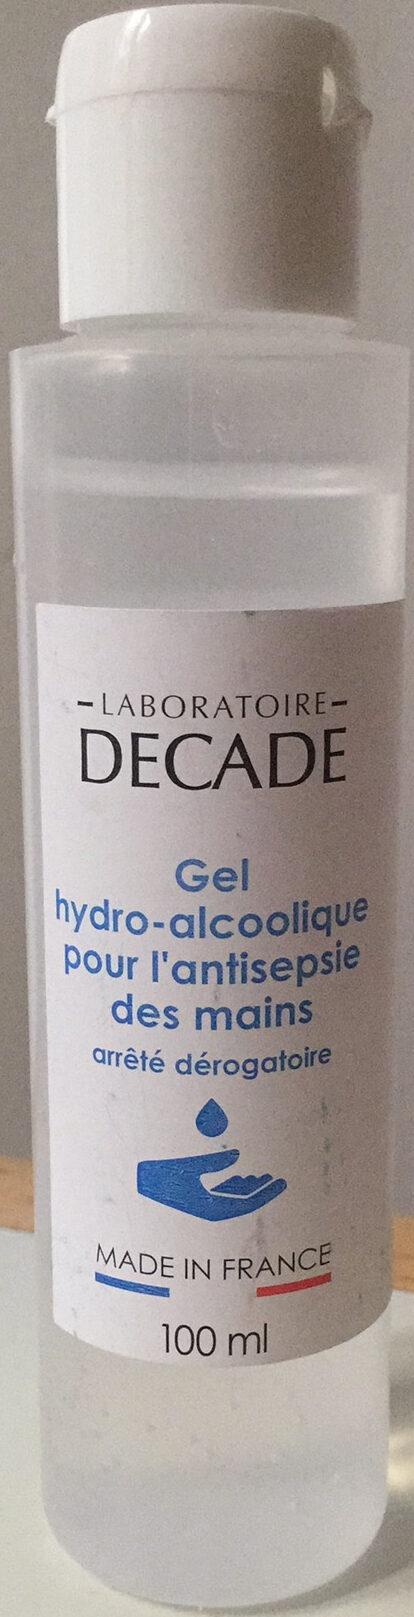 Gel hydro-alcoolique - Product - fr